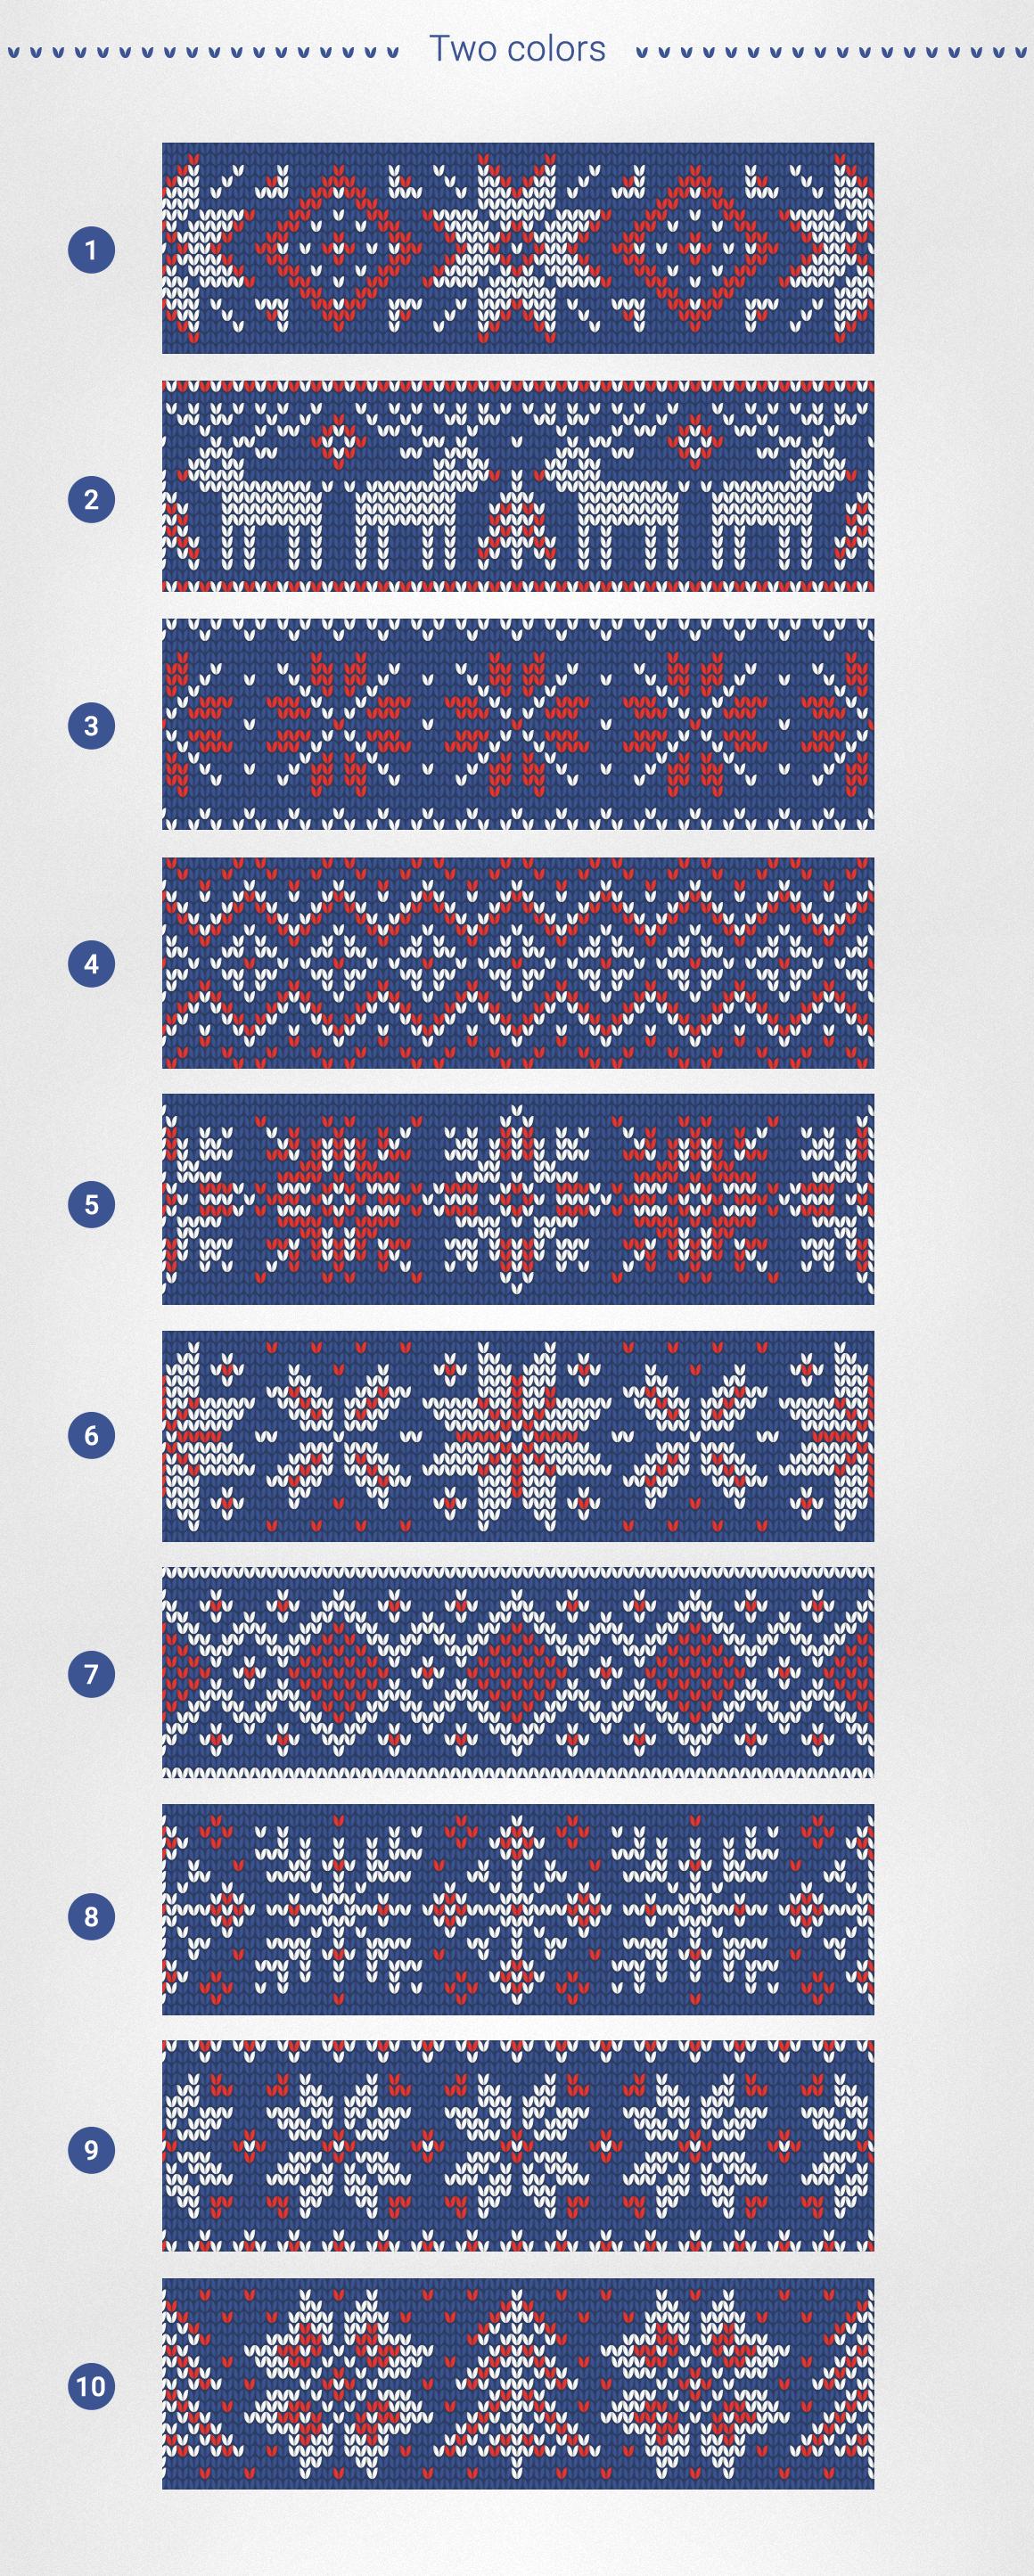 1000 Knitting Patterns Generator By Miu Miu ...